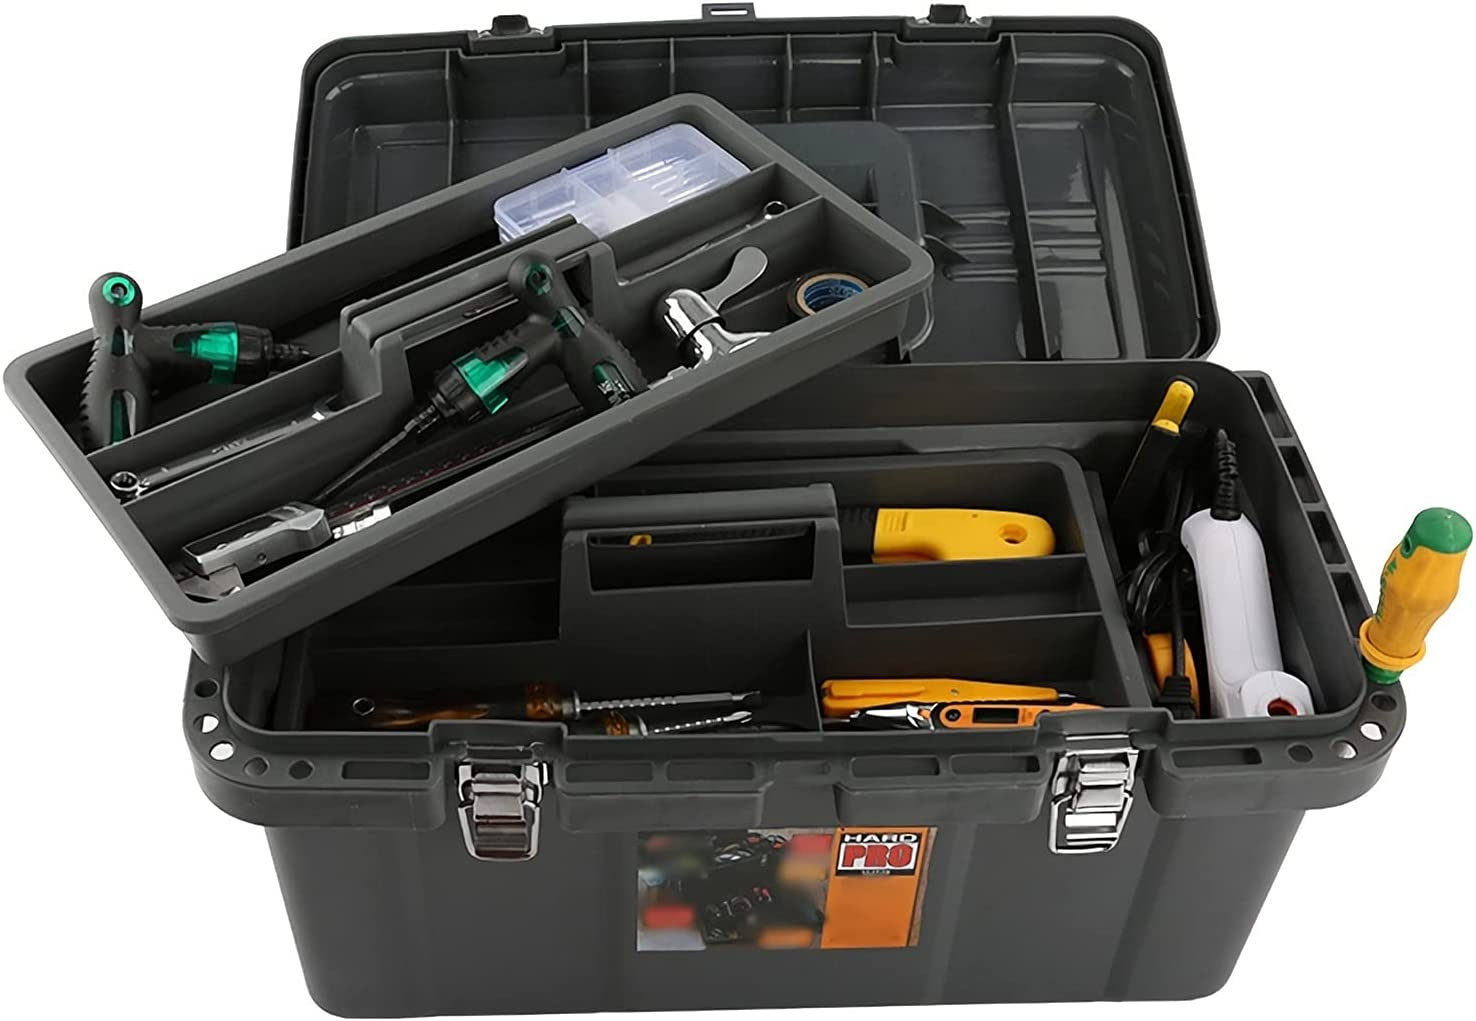 professional tool store box Latest item Plastic Tool Duty Organ Hardware Heavy Box